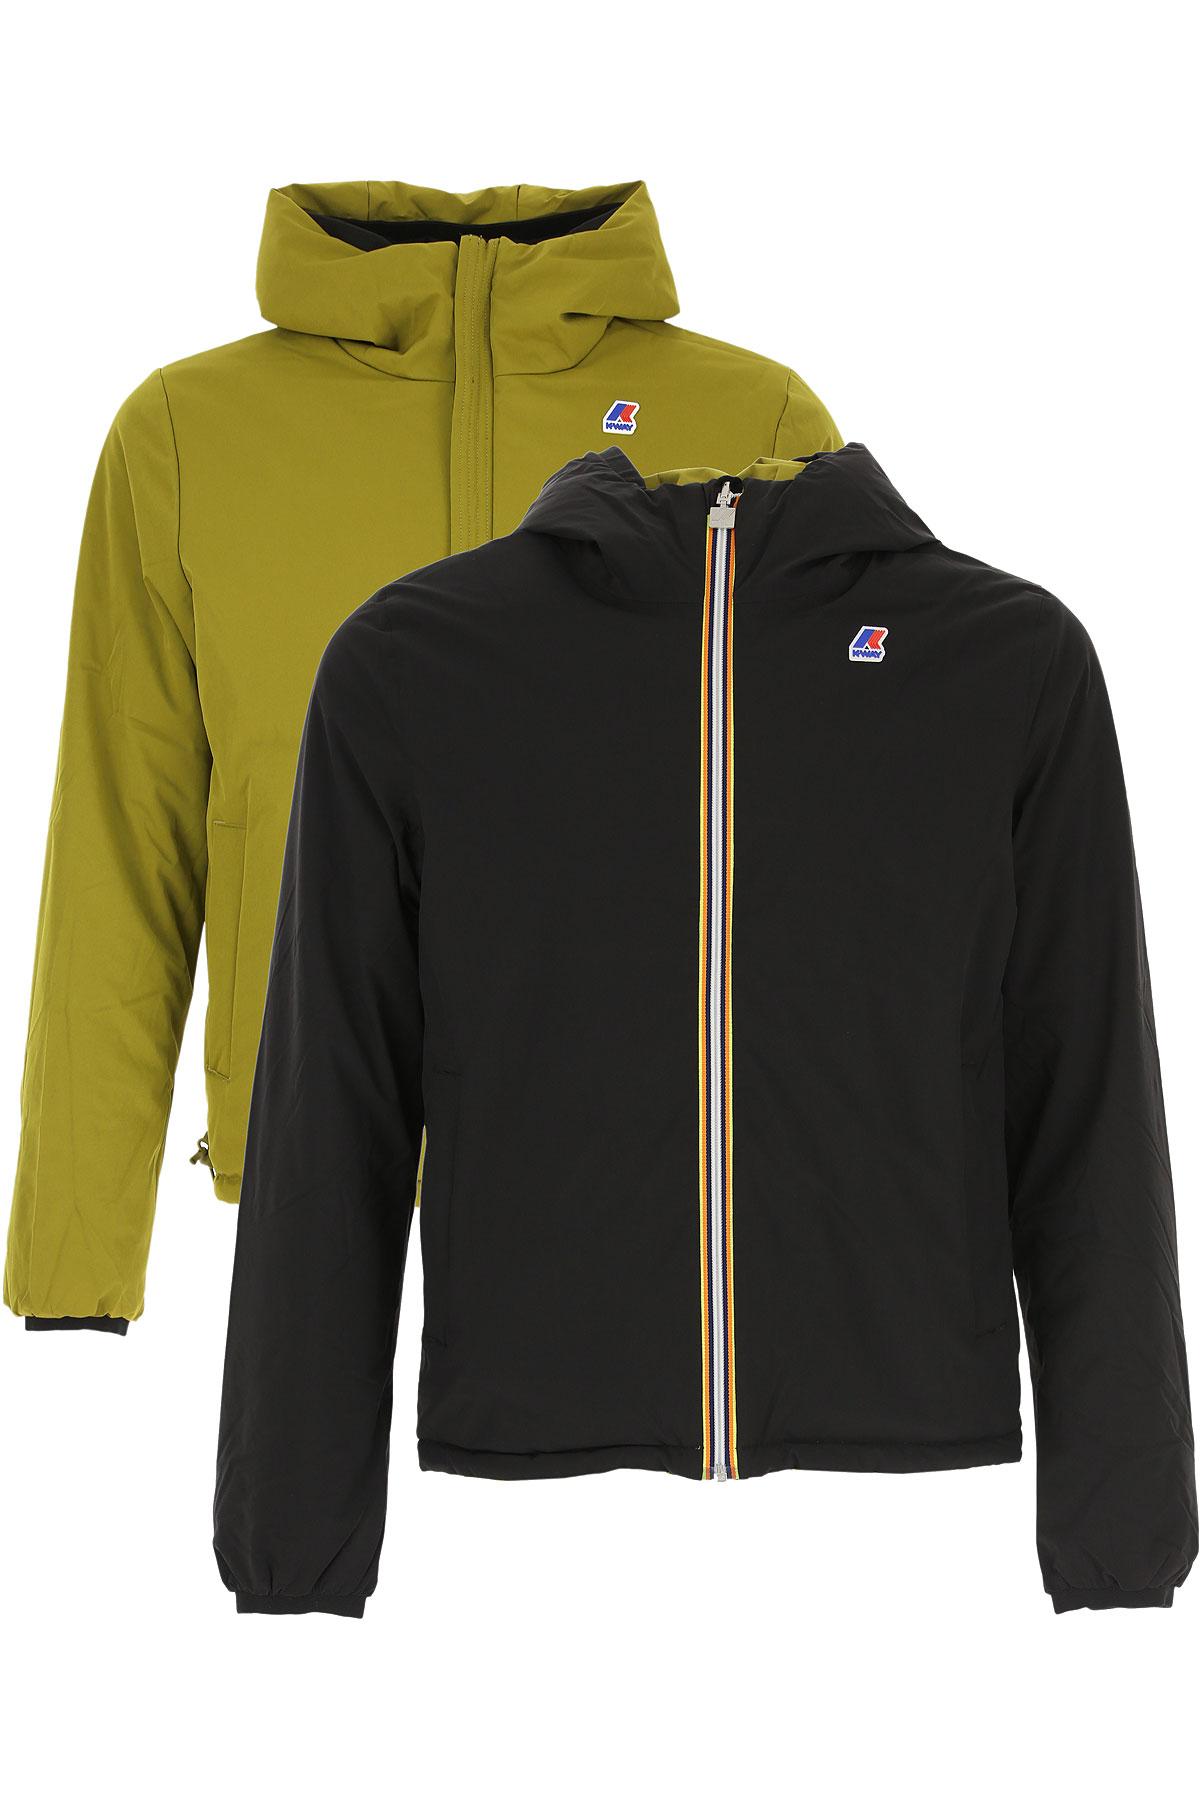 K-Way Down Jacket for Men, Puffer Ski Jacket, Black, polyester, 2019, L S XXL